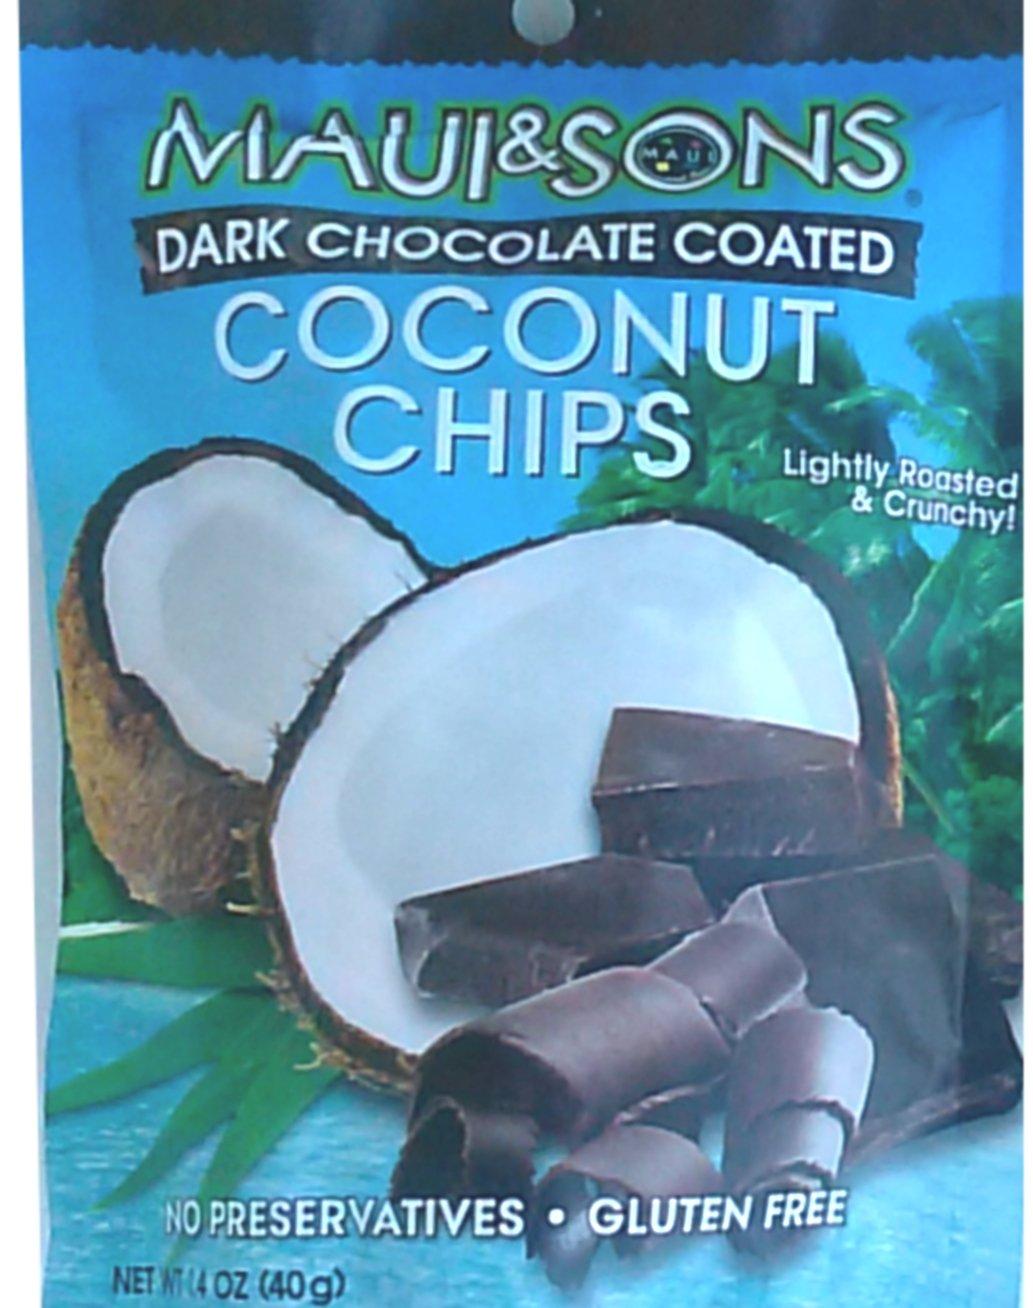 Maui & Sons Dark Chocolate Coated Coconut Chips Yumm Yummy